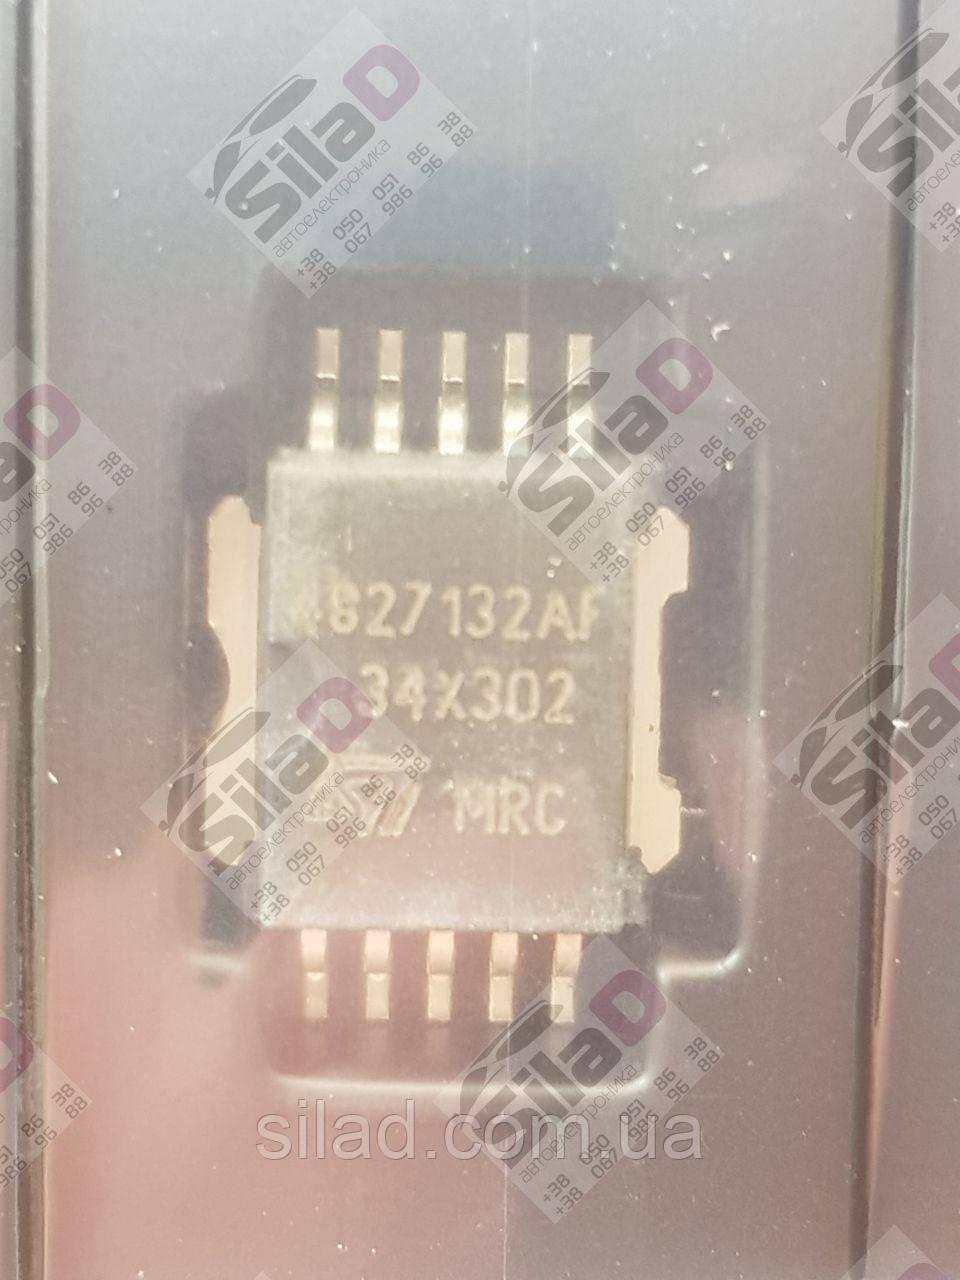 Микросхема 4827132AF STMicroelectronics корпус PowerSO-10